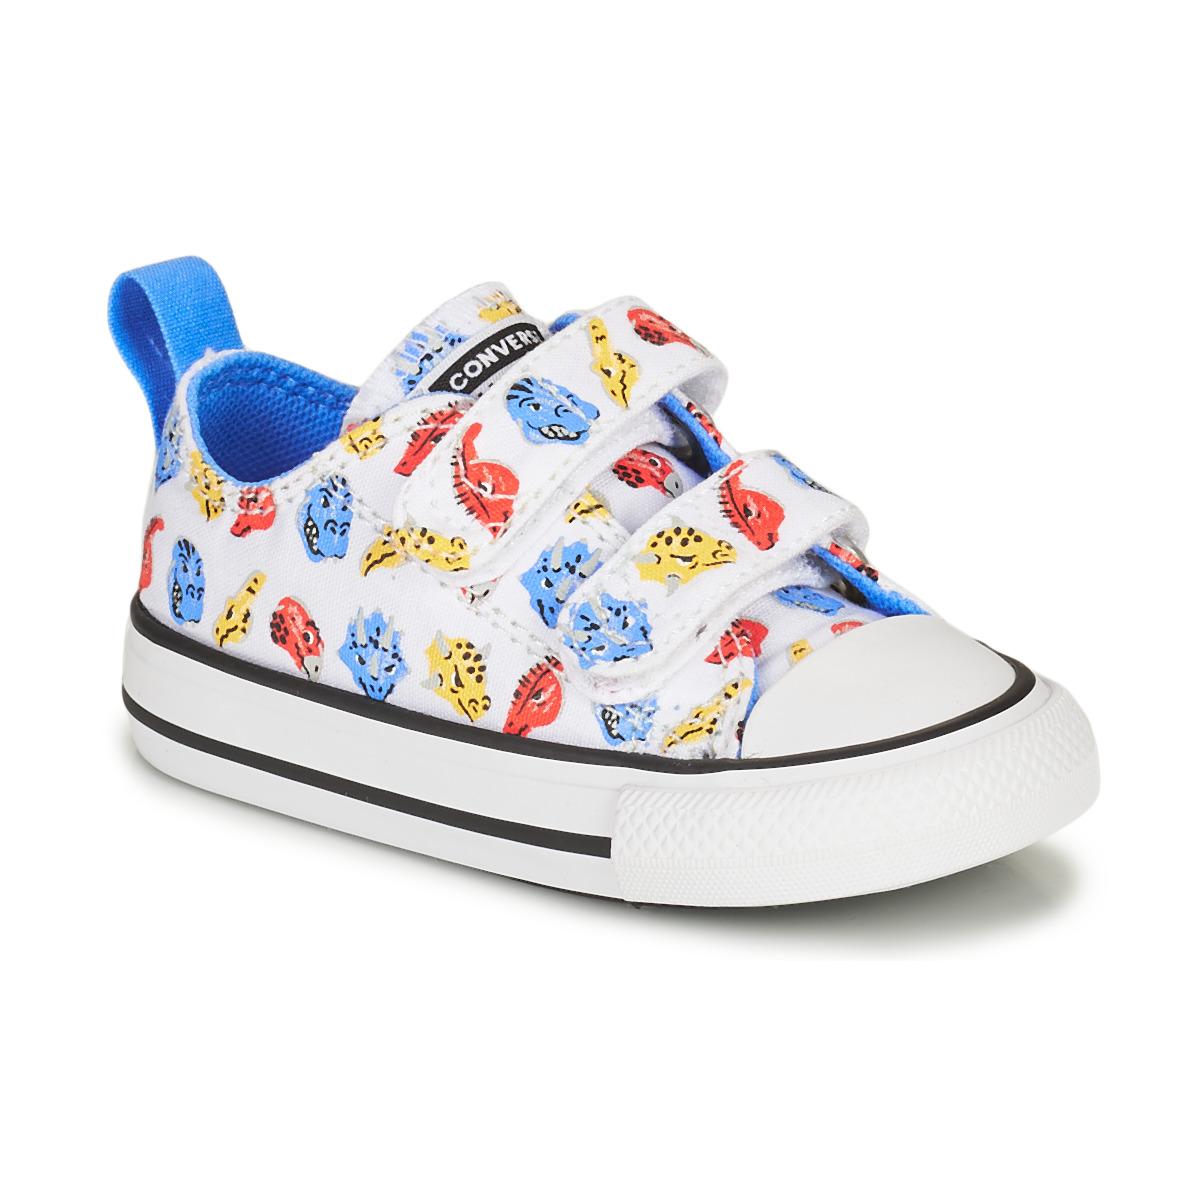 scarpe da ginnastica ragazza converse